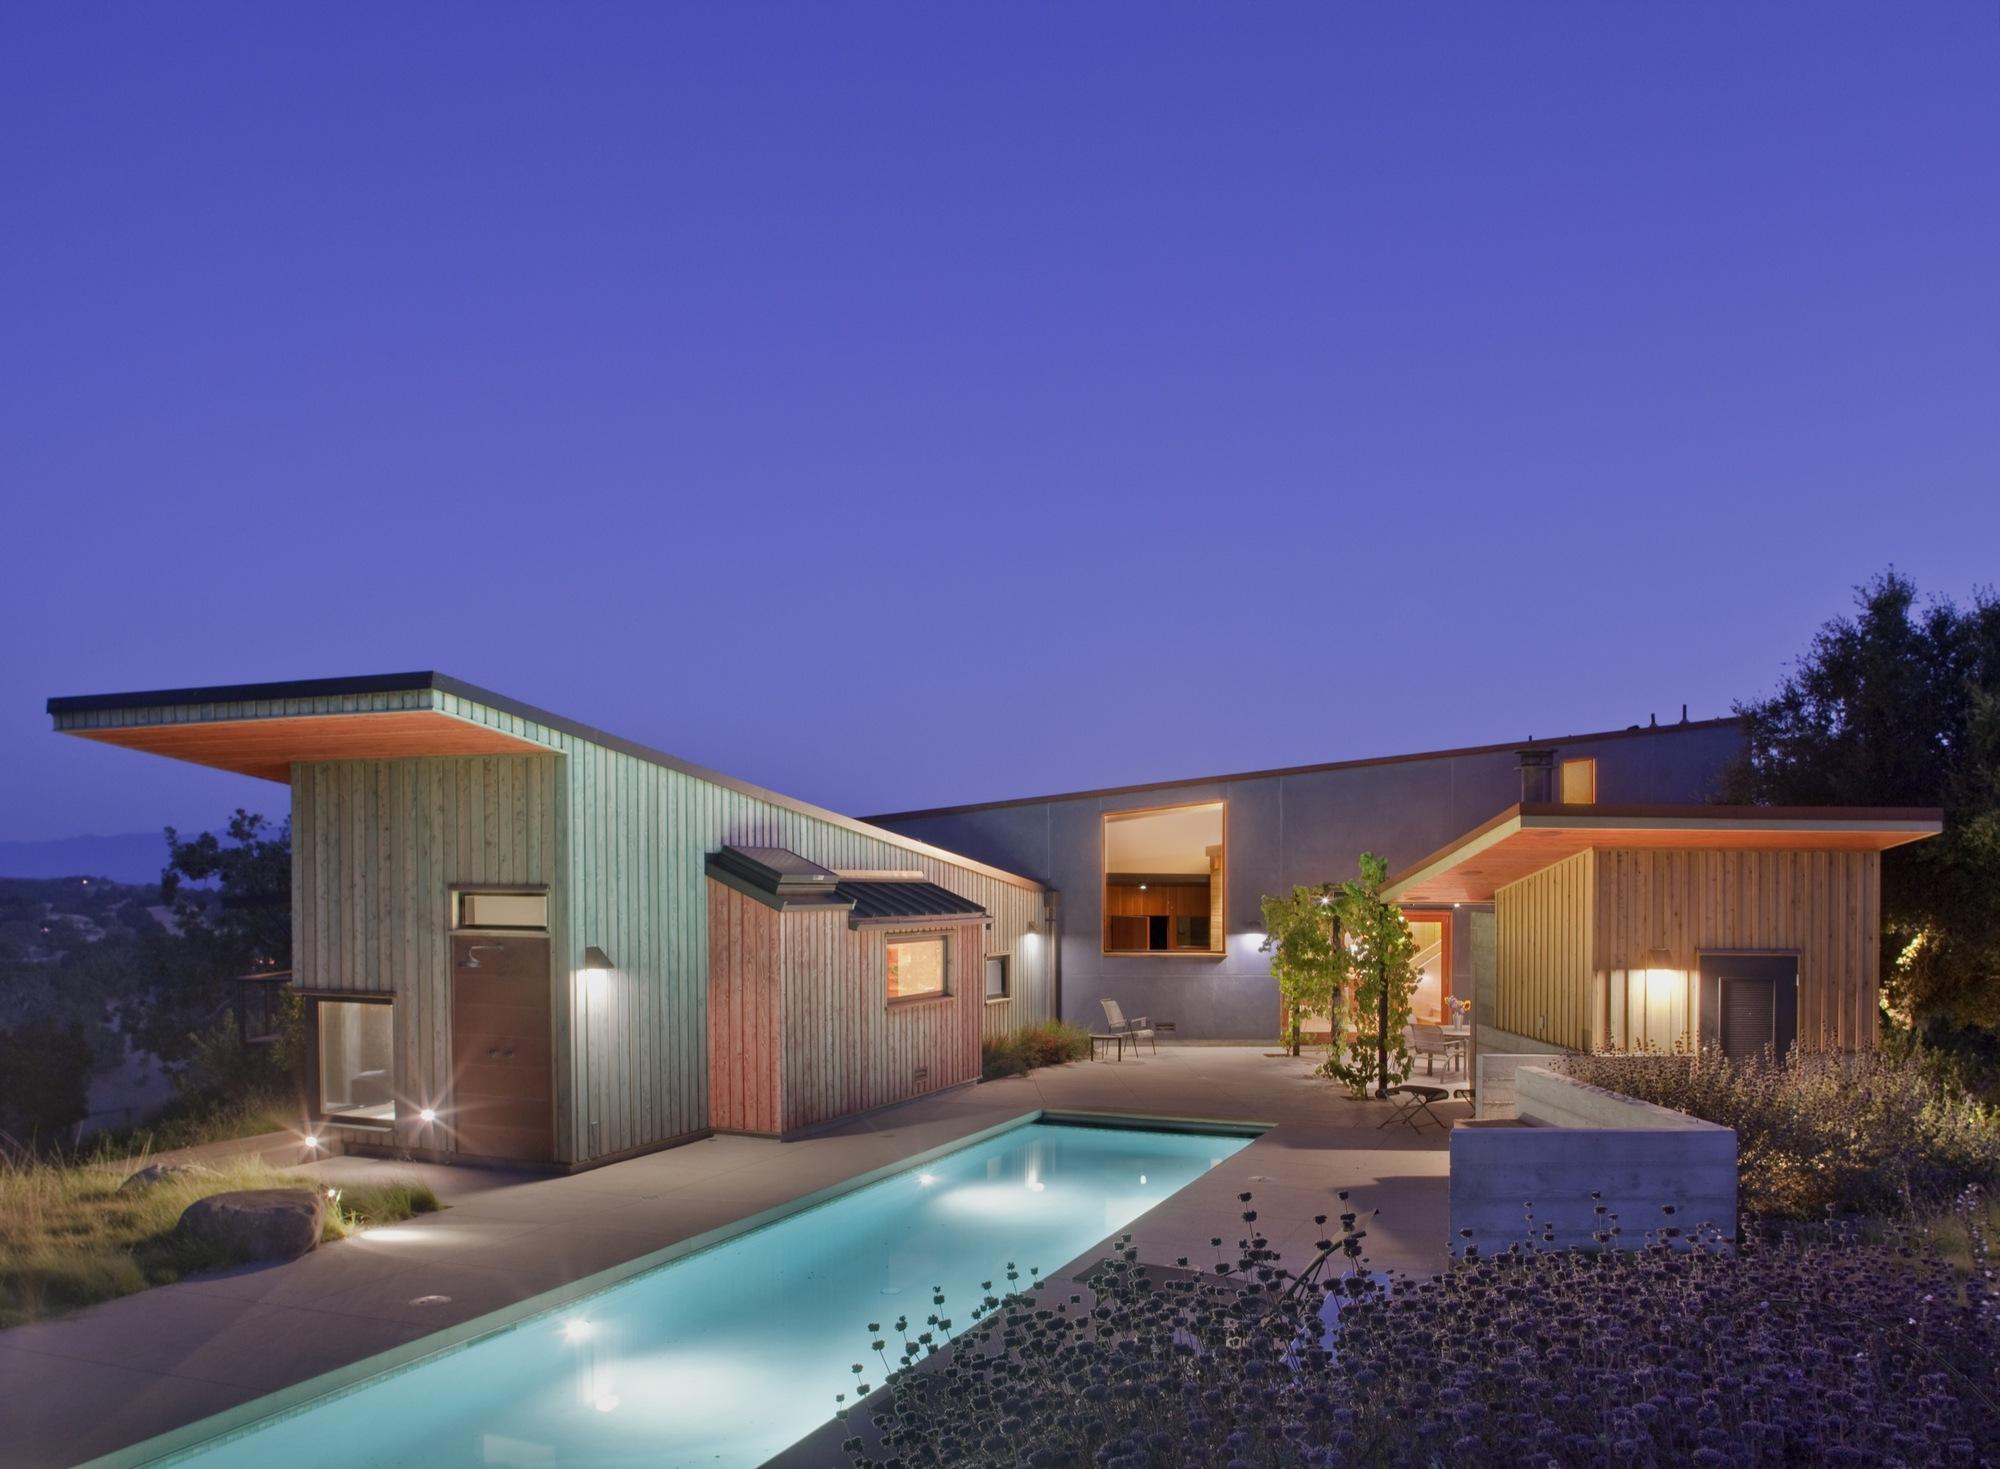 Casa Santa Ynez / Fernau + Hartman Architects, © Richard Barnes